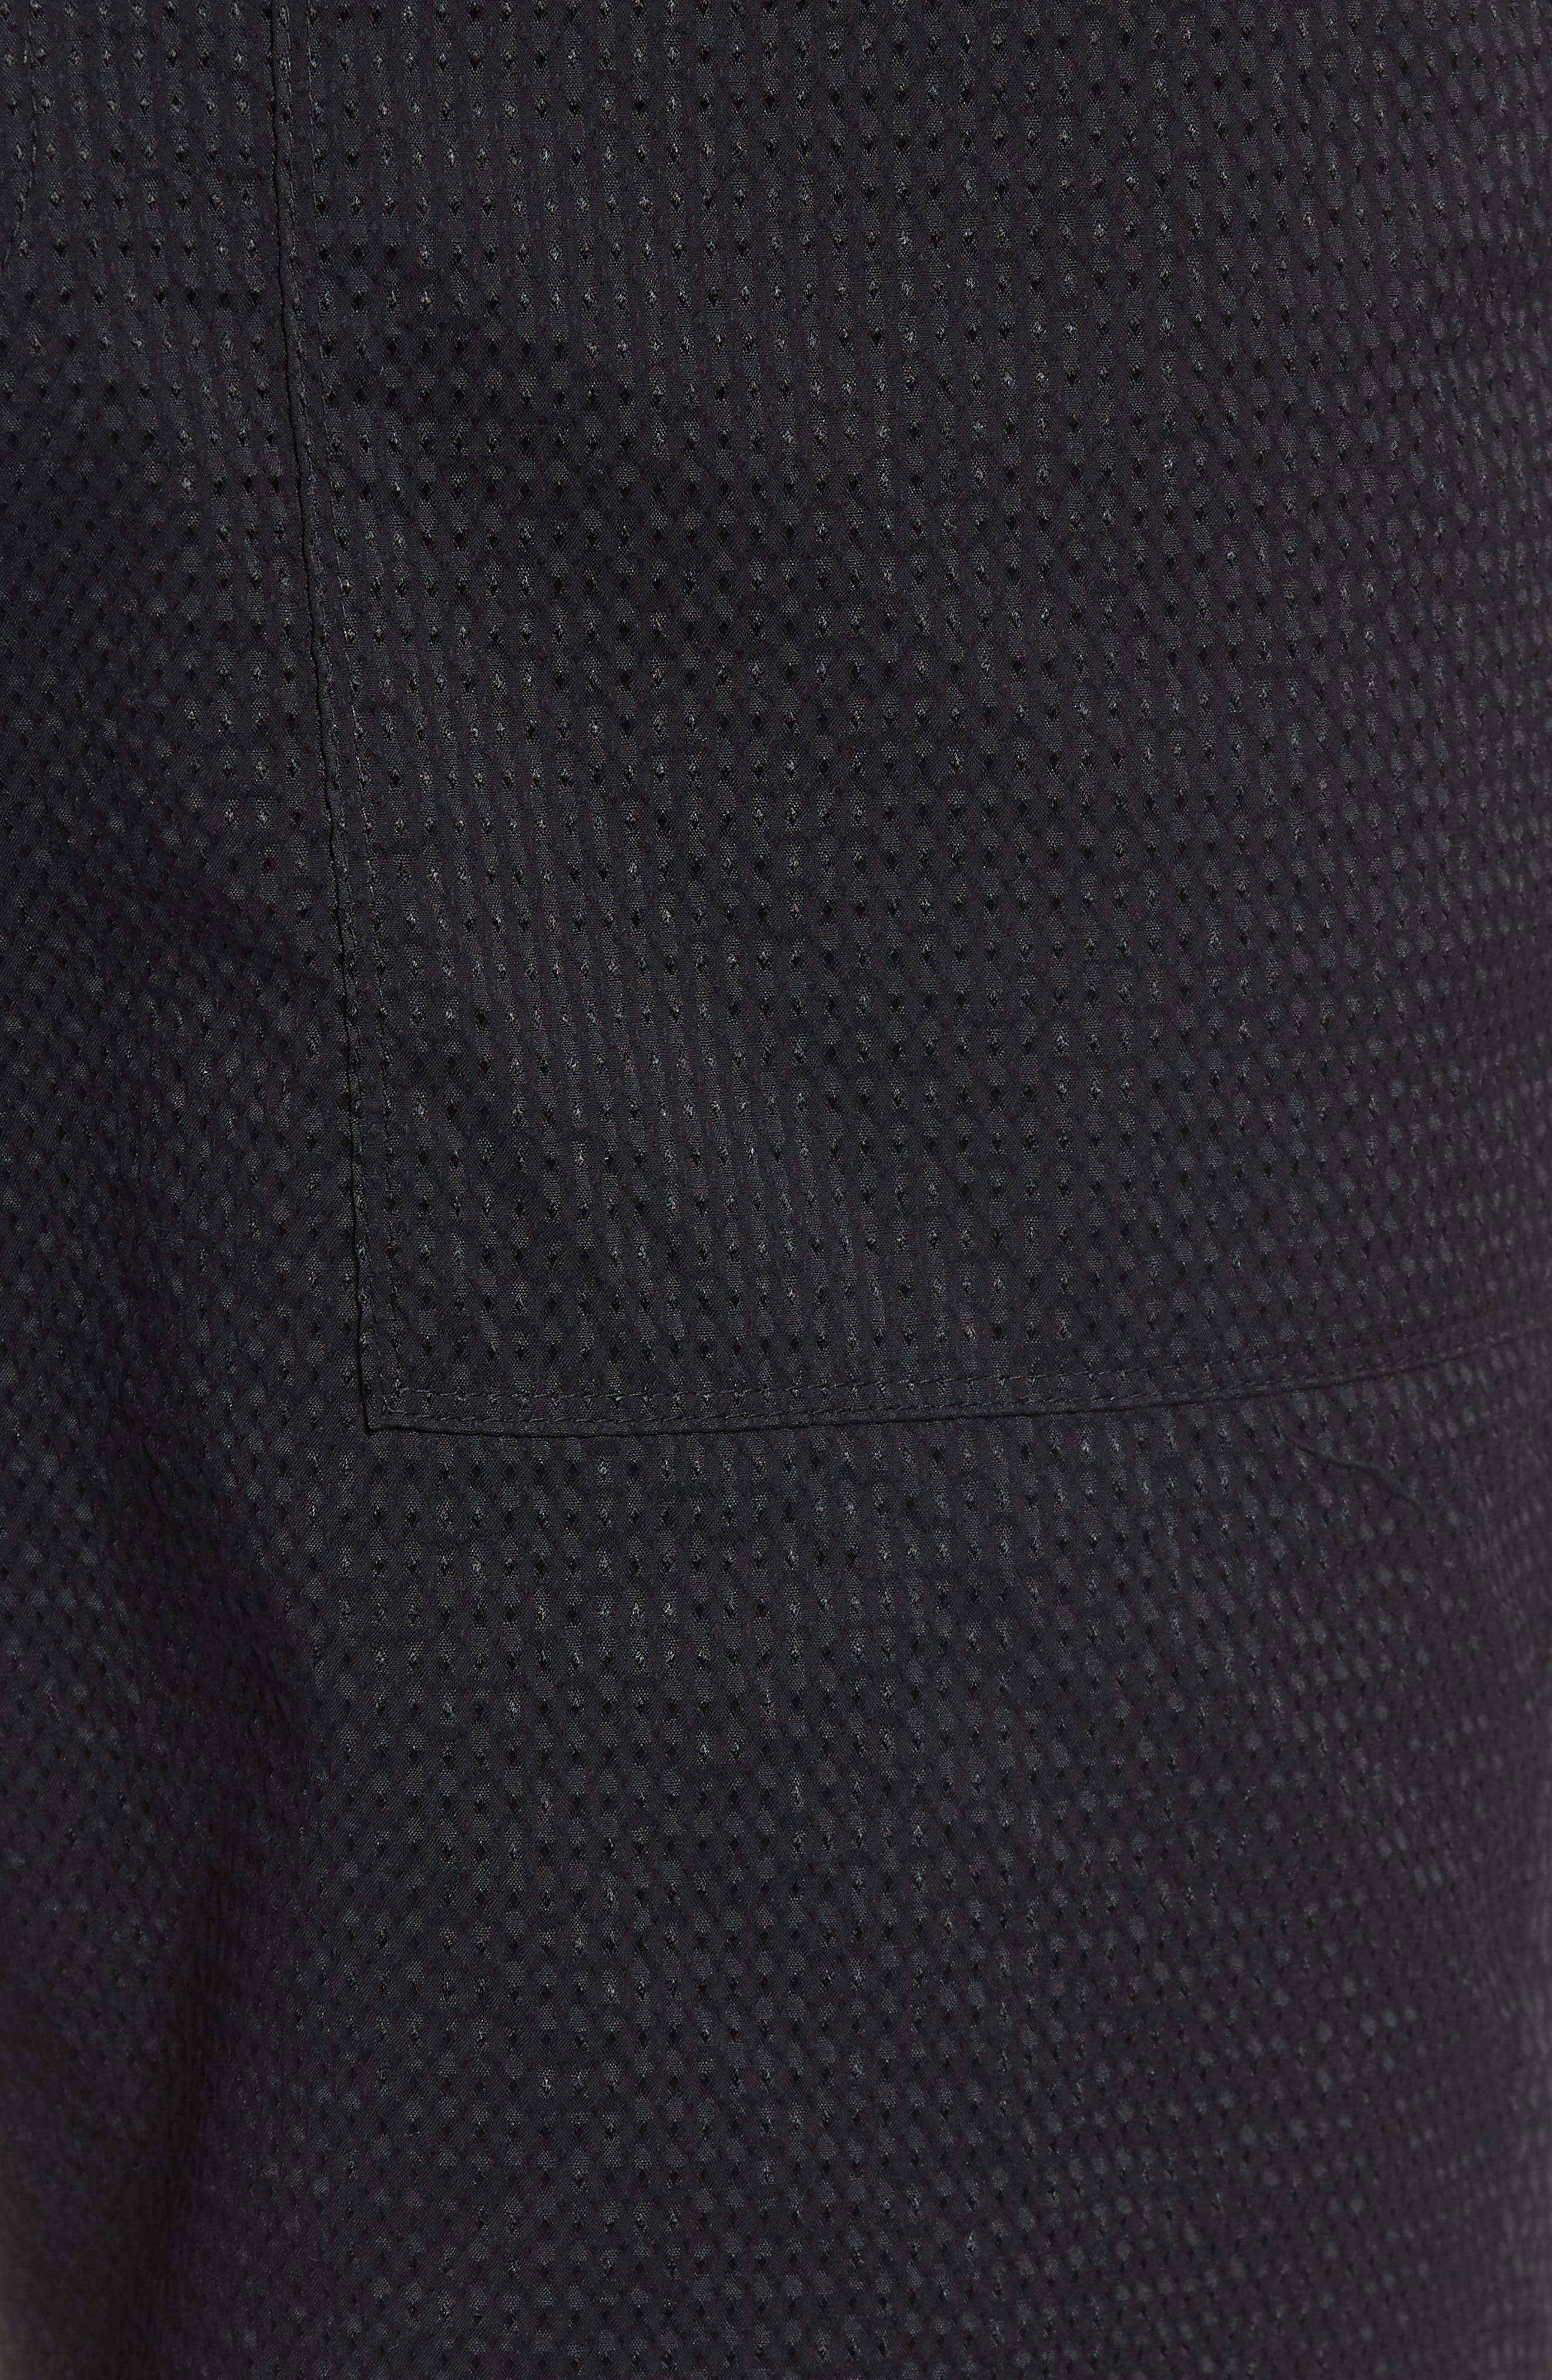 Utility Seersucker Shorts,                             Alternate thumbnail 5, color,                             Black Seersucker